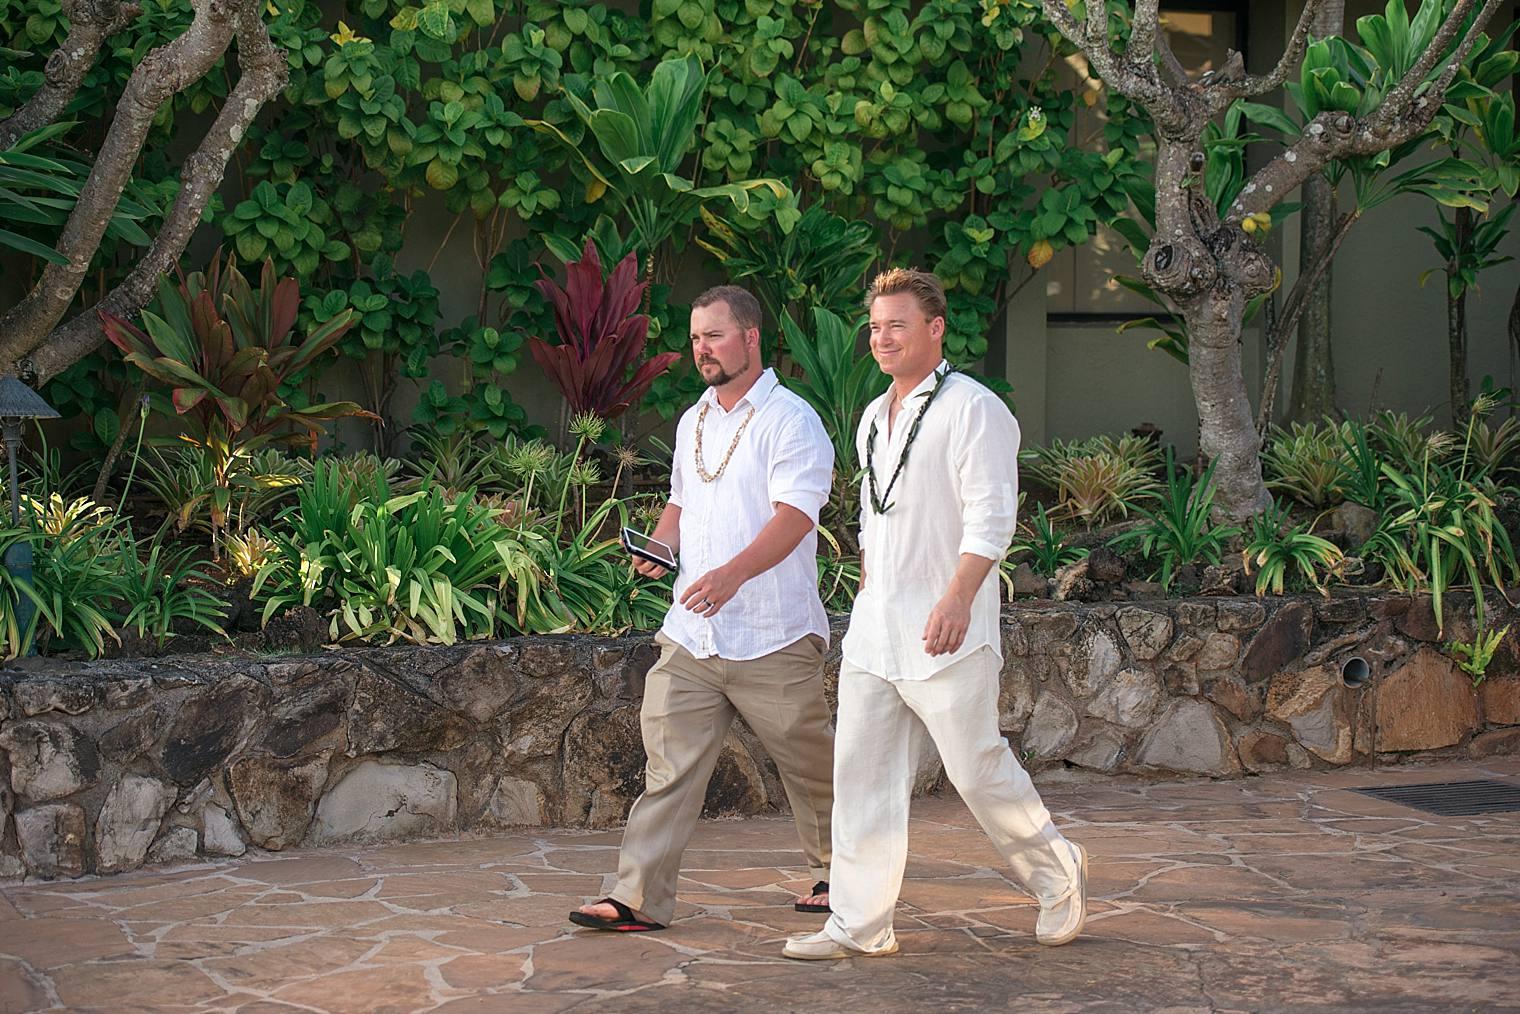 Destination Wedding at Sea House Napili - Maui Wedding Photographer_0013